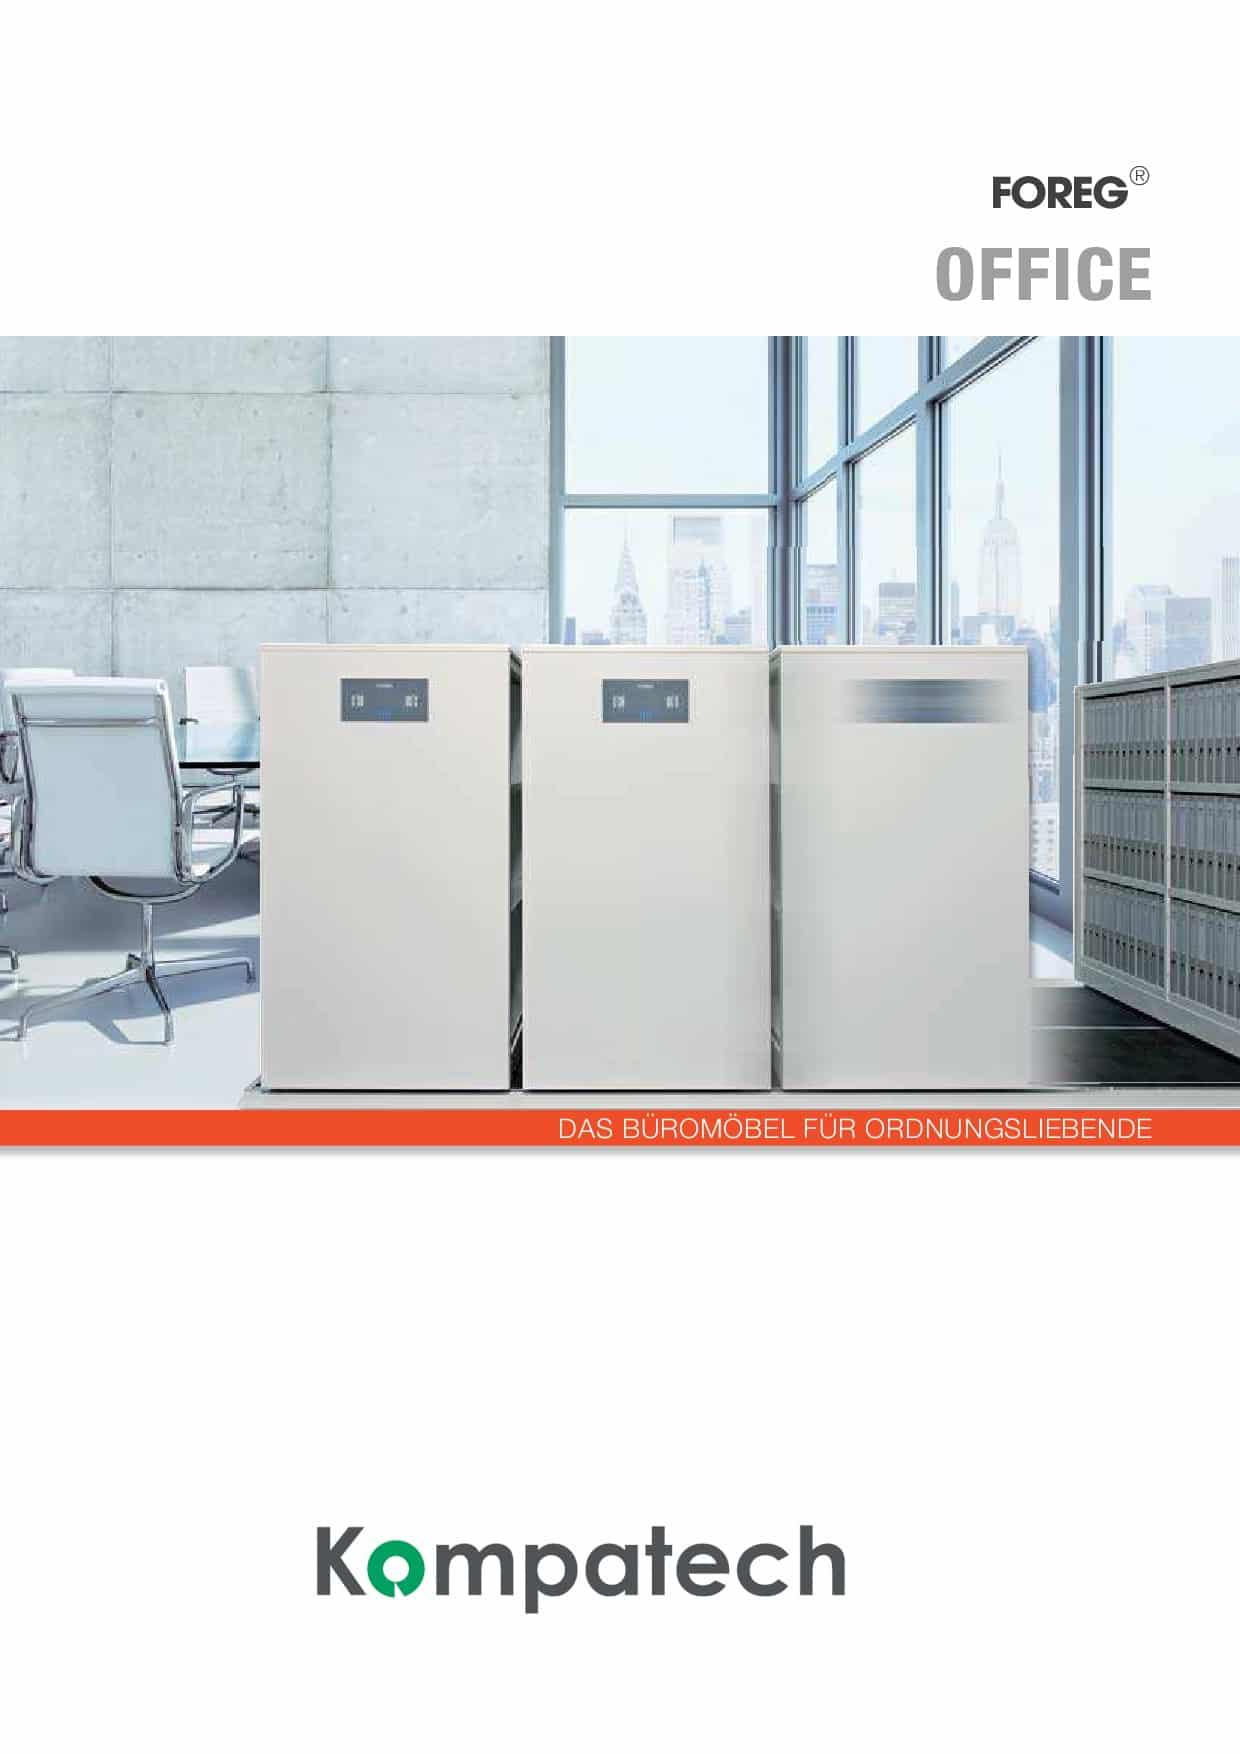 Archiv Rollregal Katalog Foreq Office